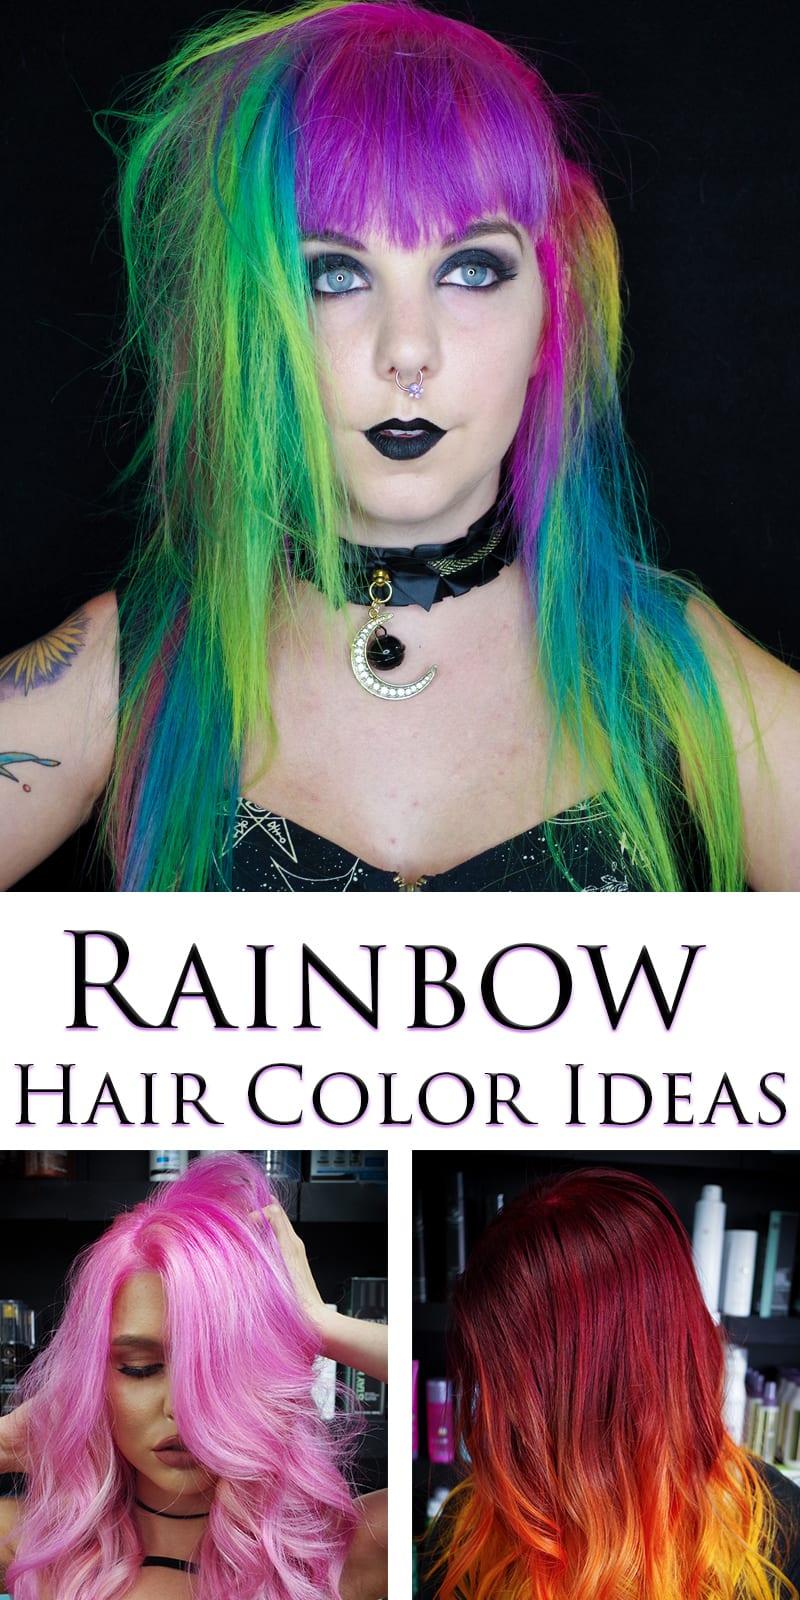 Rainbow Hair Color Ideas With Christian From IStyleXG